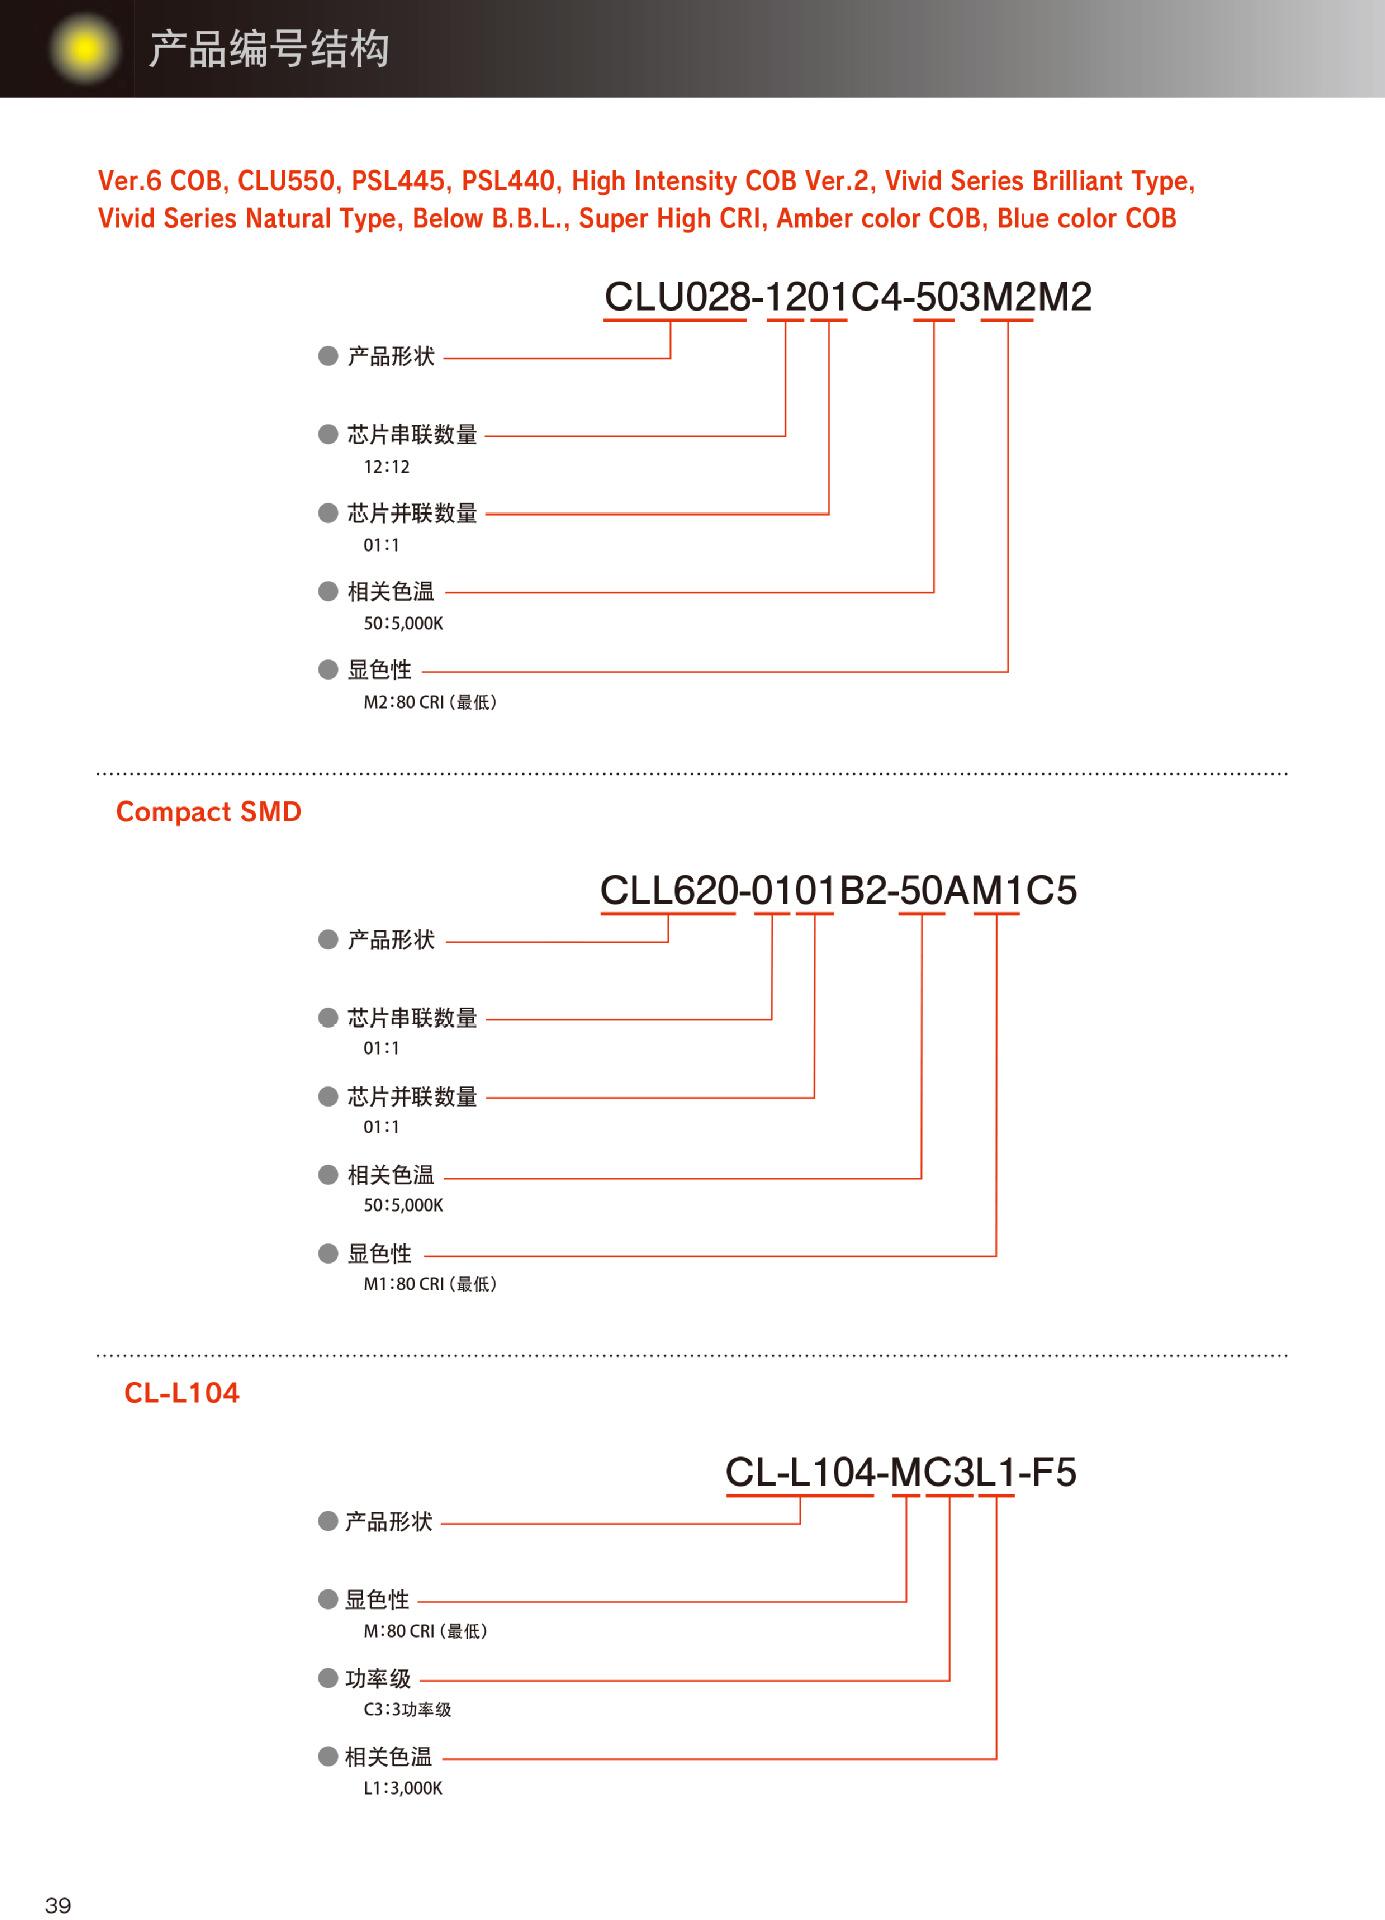 9Ver6 产品简介2017-40